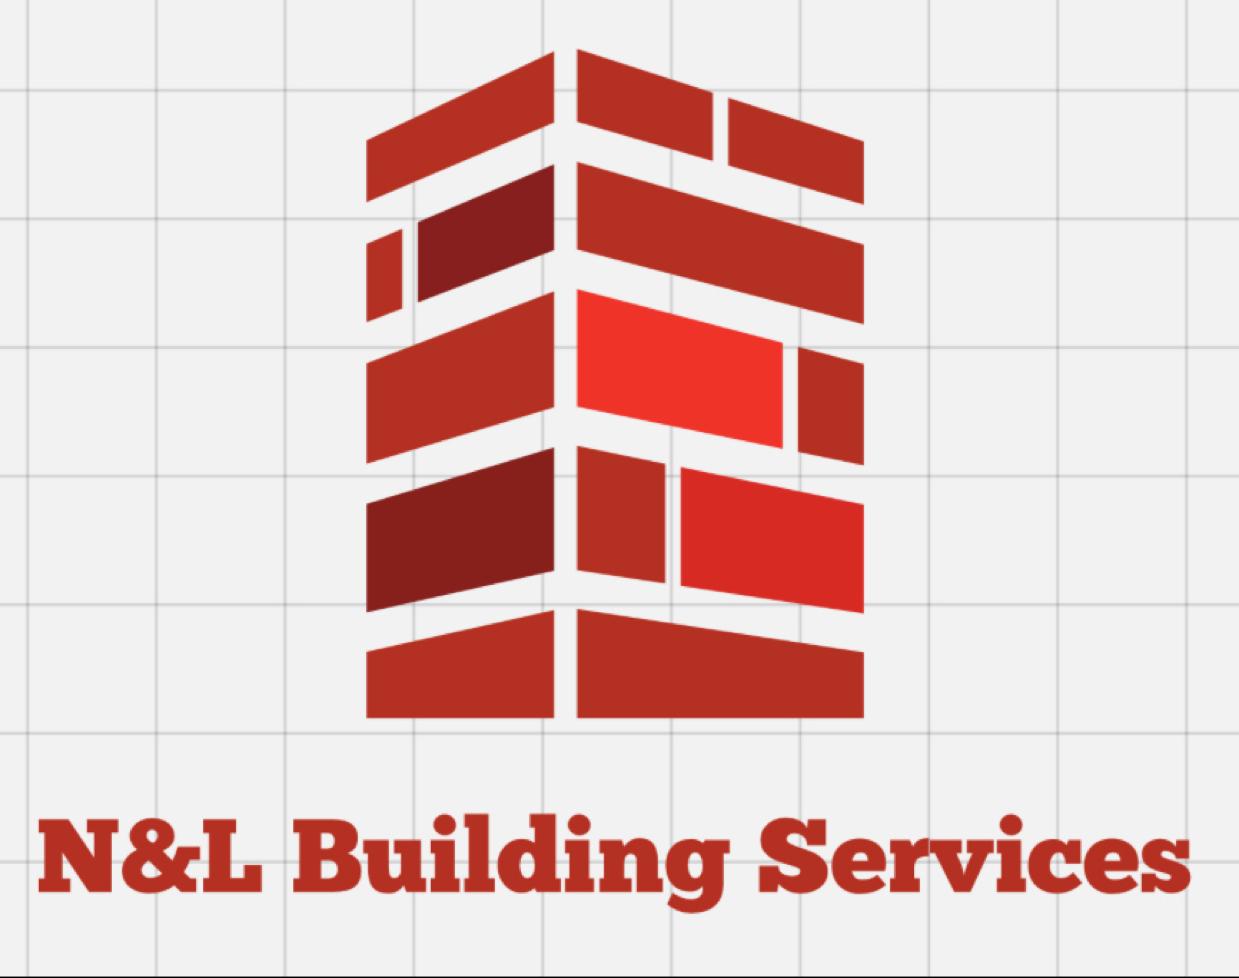 N&LBuildingServices